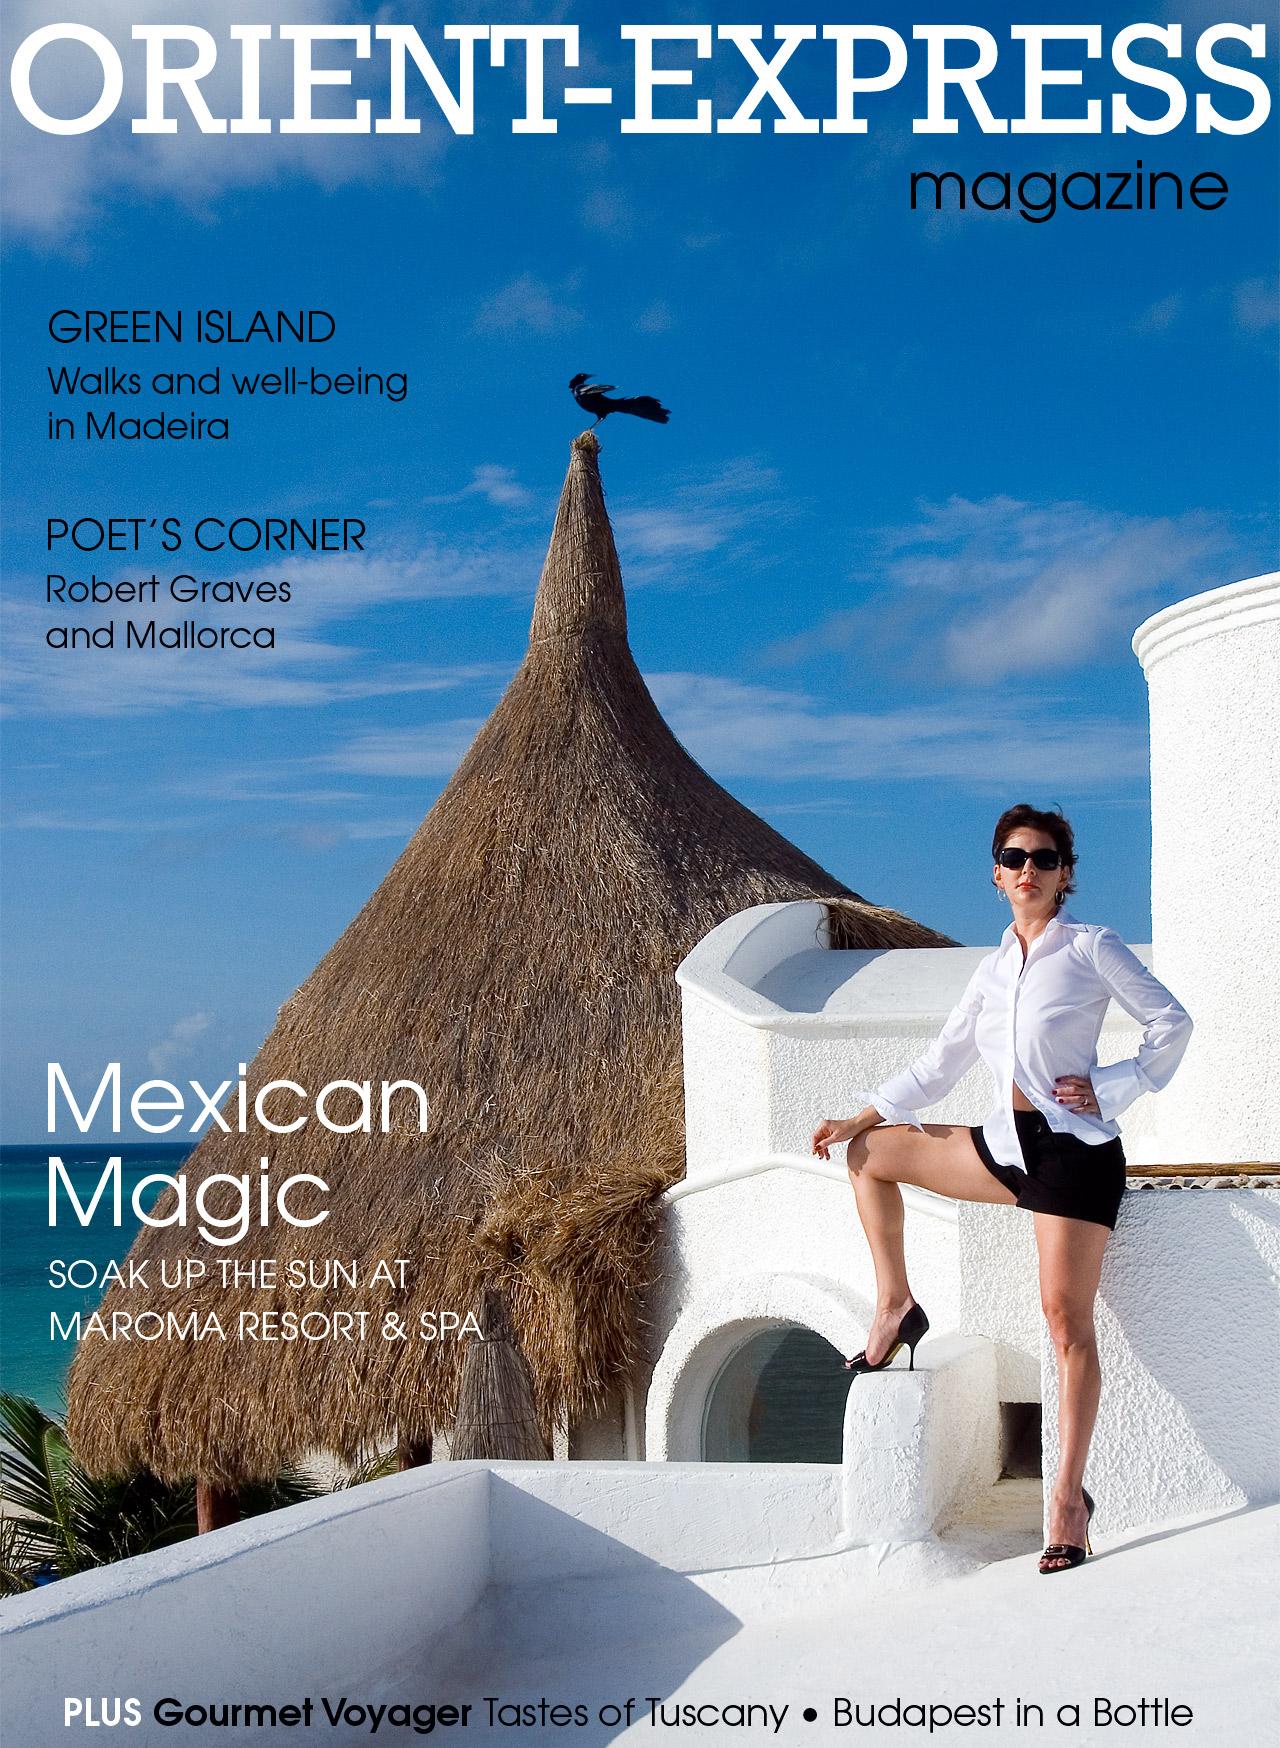 magazine_cover.jpg